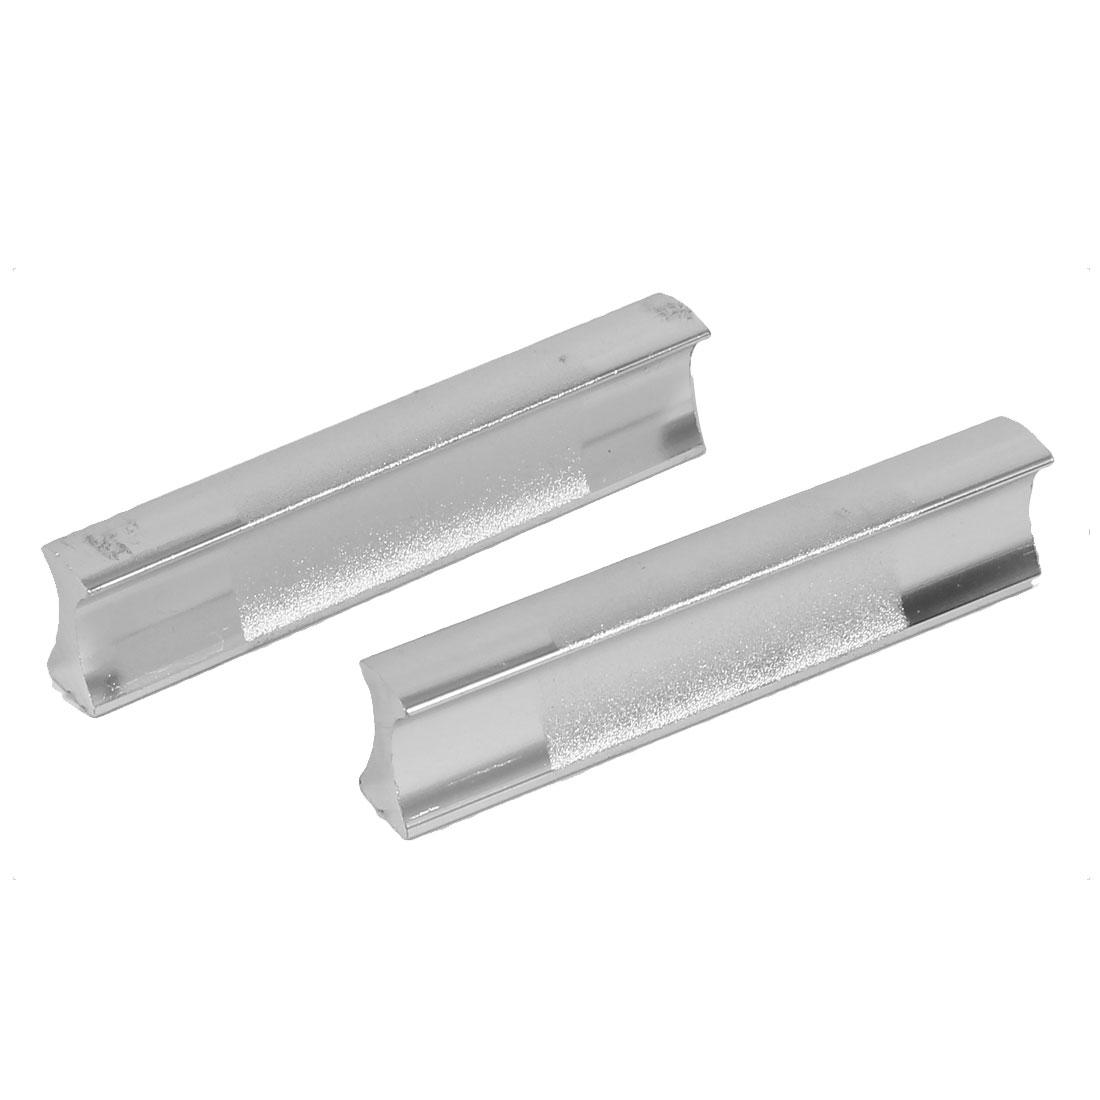 64mm Spacing Rectangular Pulls Cabinet Dresser Sliding Door Handle Silver Tone 2 Pcs